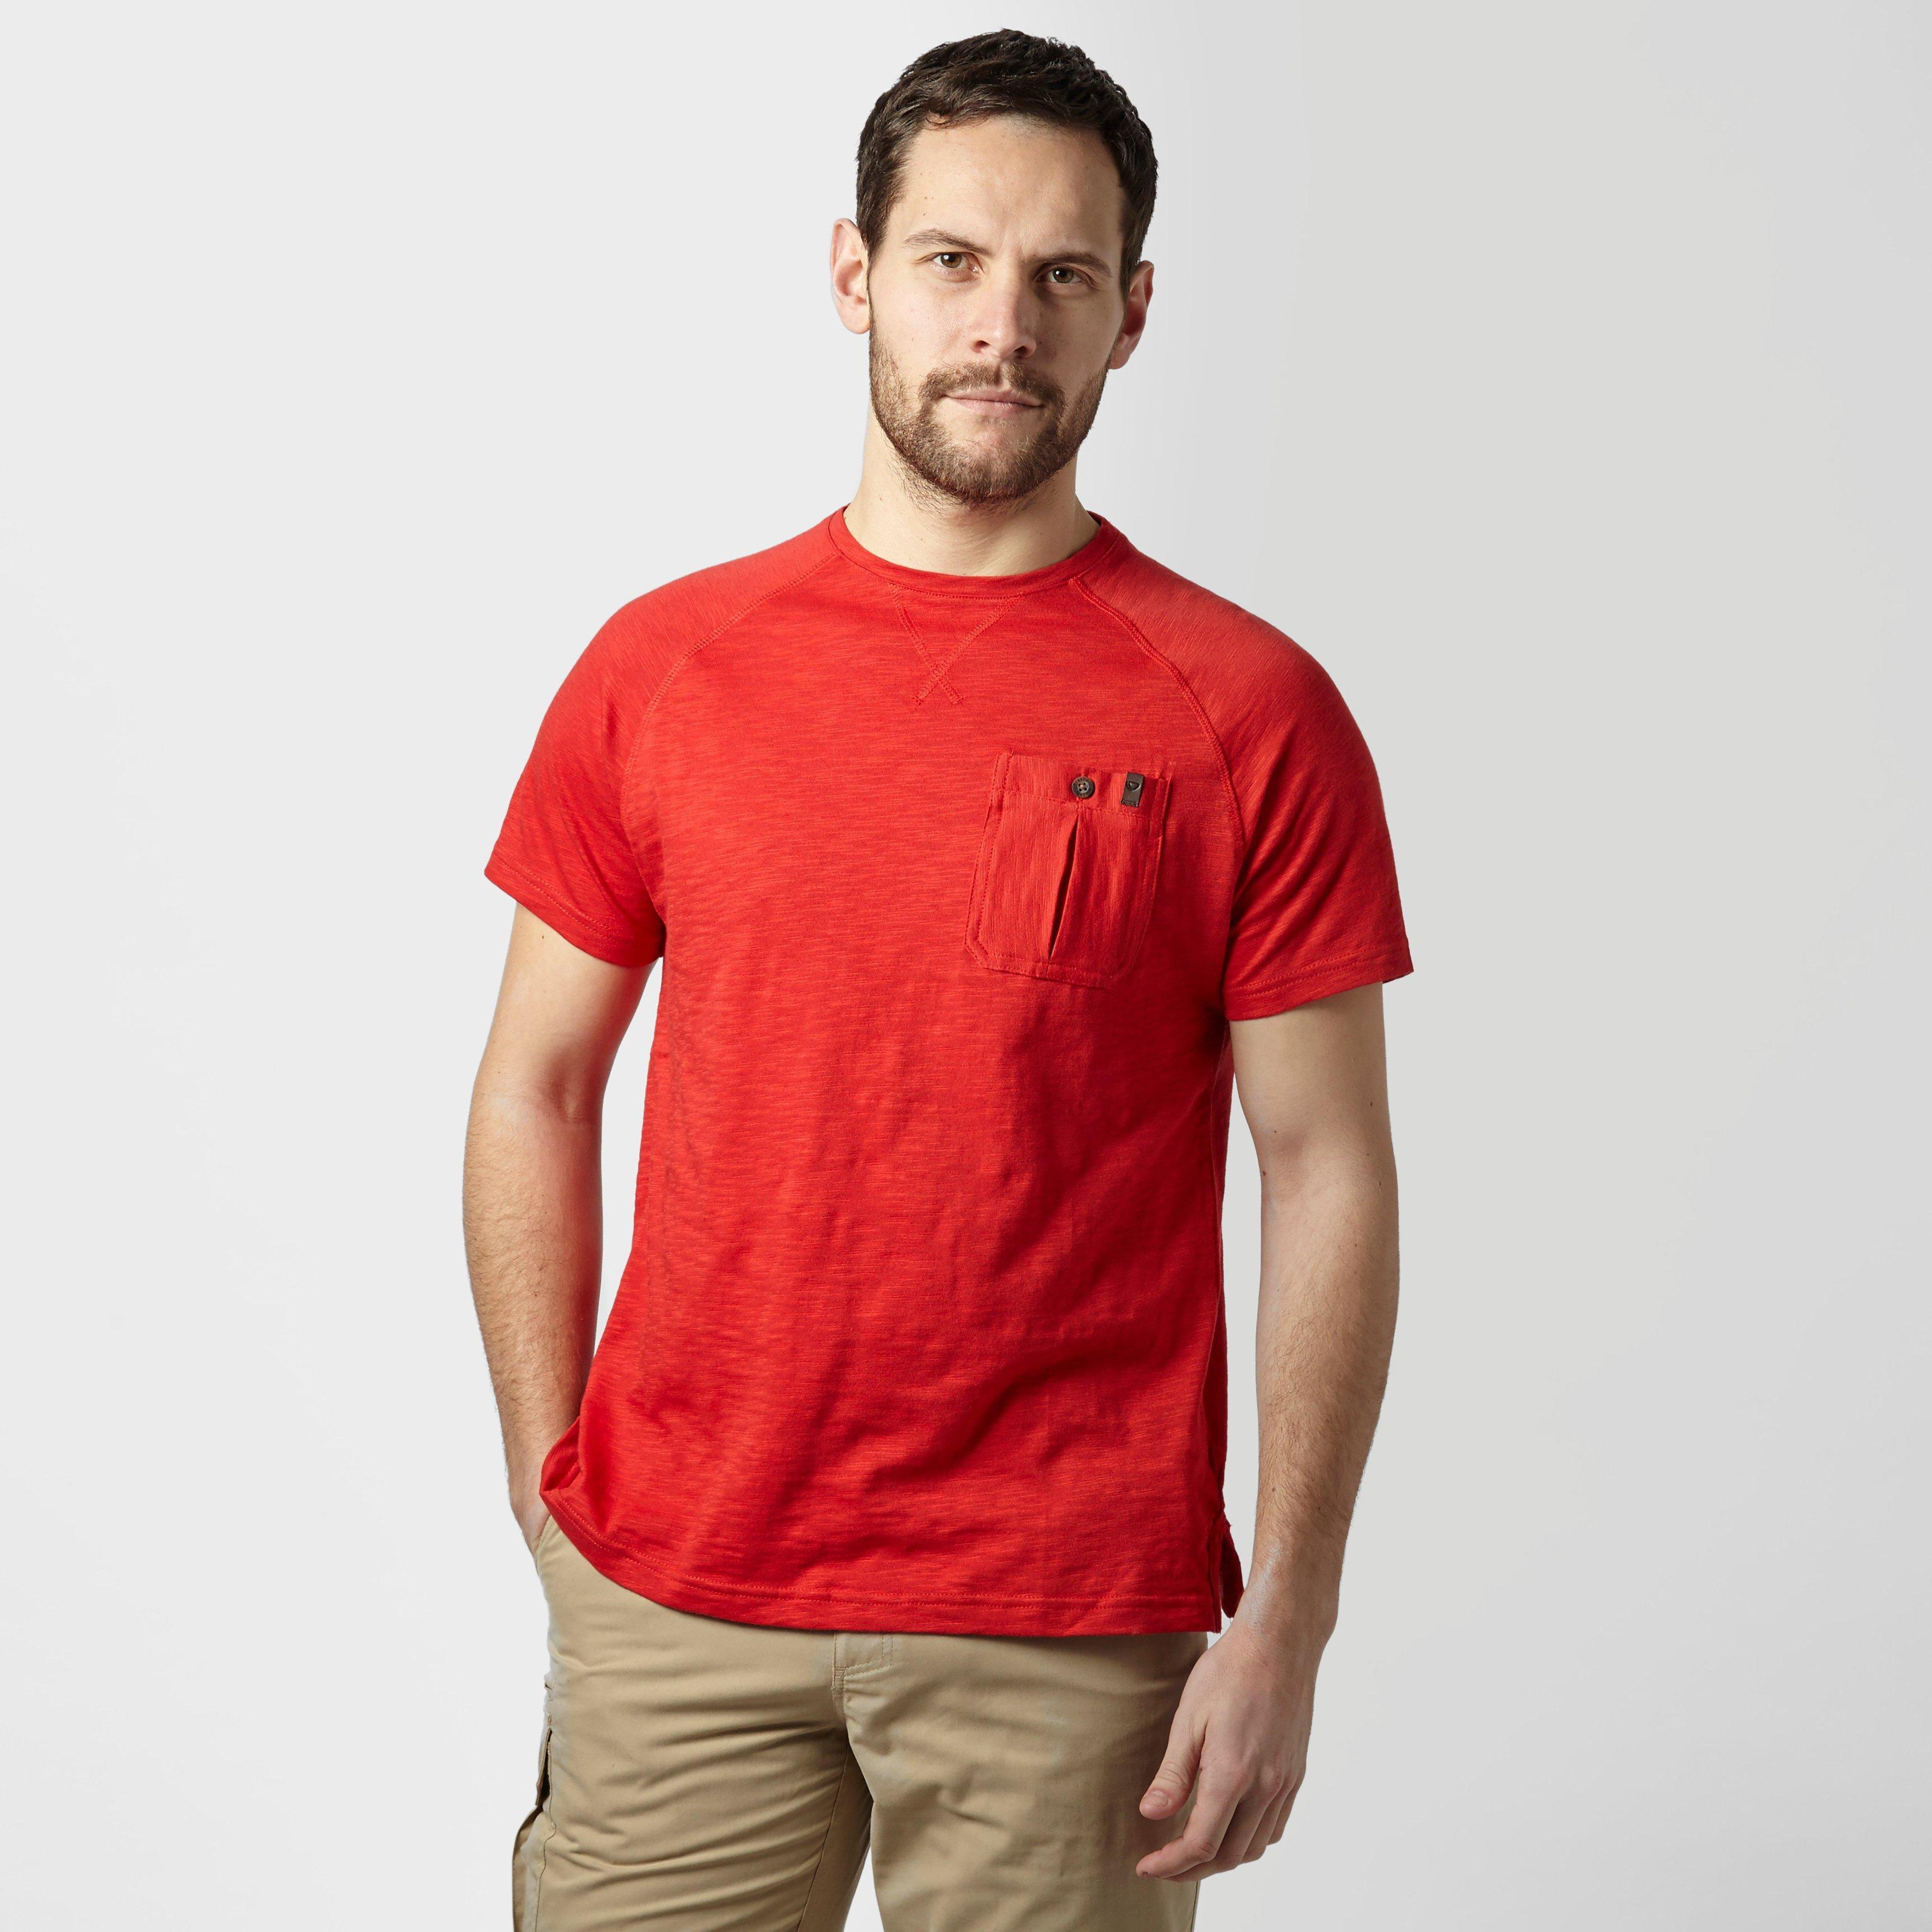 Brasher Mens Hopegill T-shirt - Red/red  Red/red